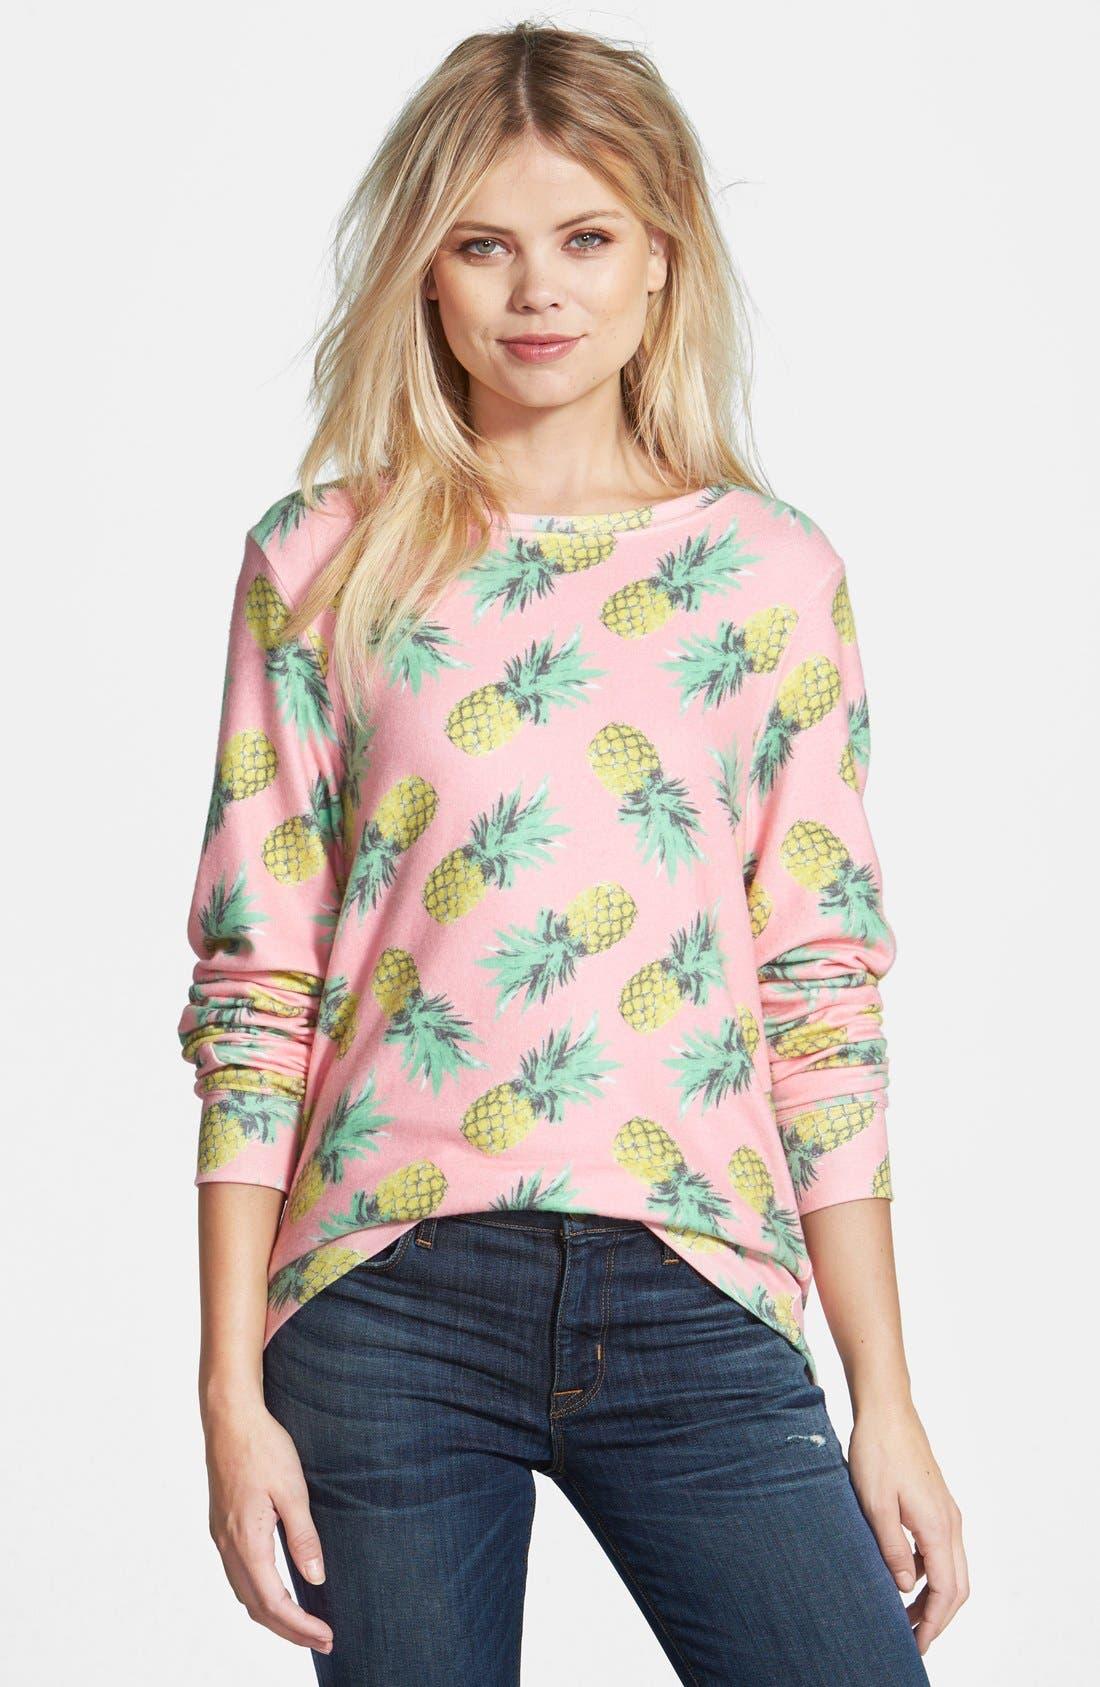 'Pineapple Palace' Sweatshirt,                             Main thumbnail 1, color,                             690